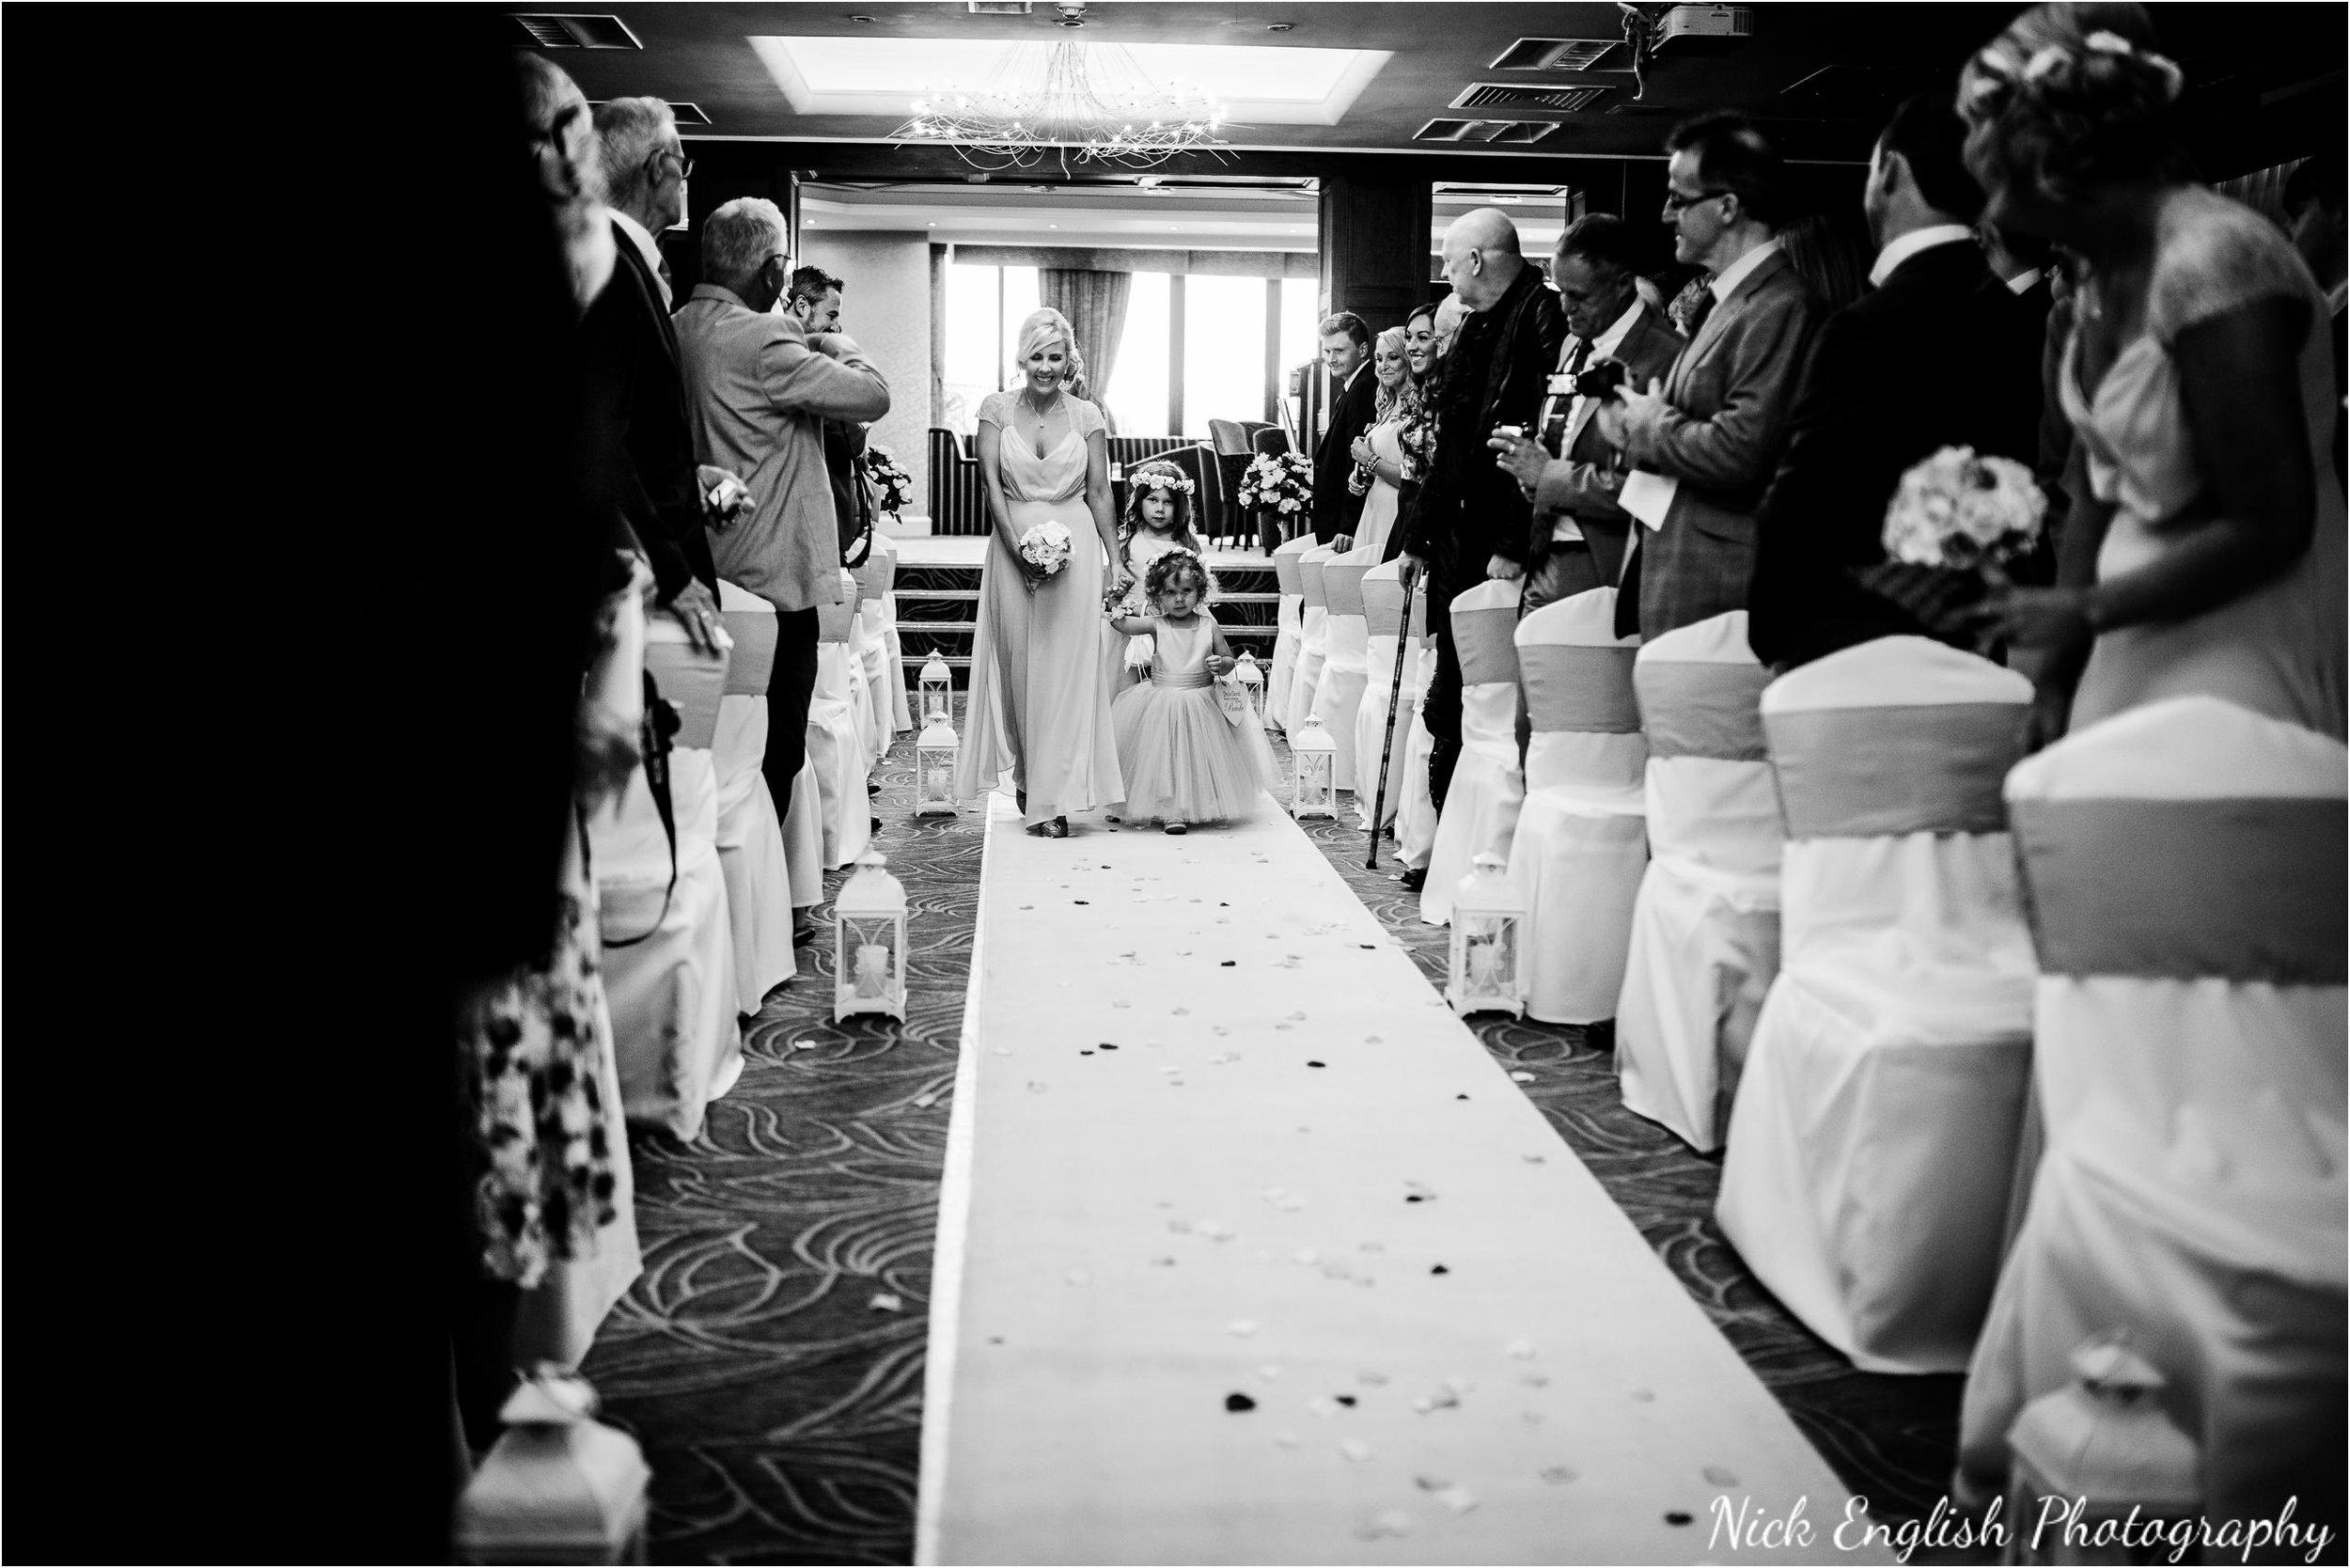 Emily David Wedding Photographs at Barton Grange Preston by Nick English Photography 58jpg.jpeg